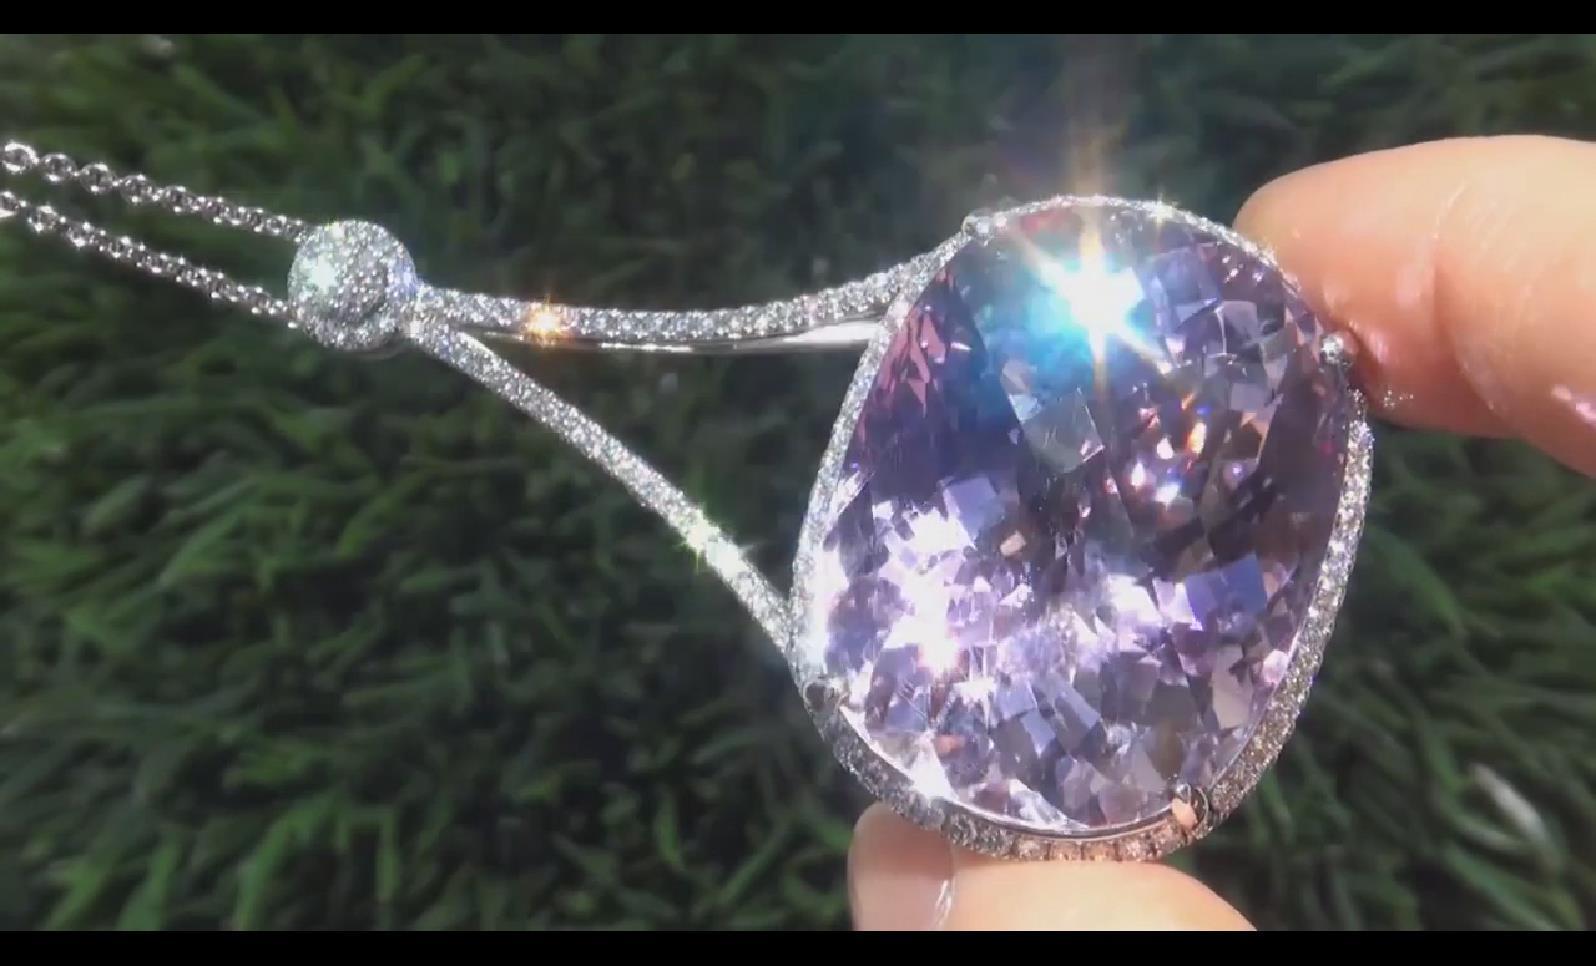 BS 010 BS 10 首饰展示 珠宝工艺 珠宝设计 珠宝展示